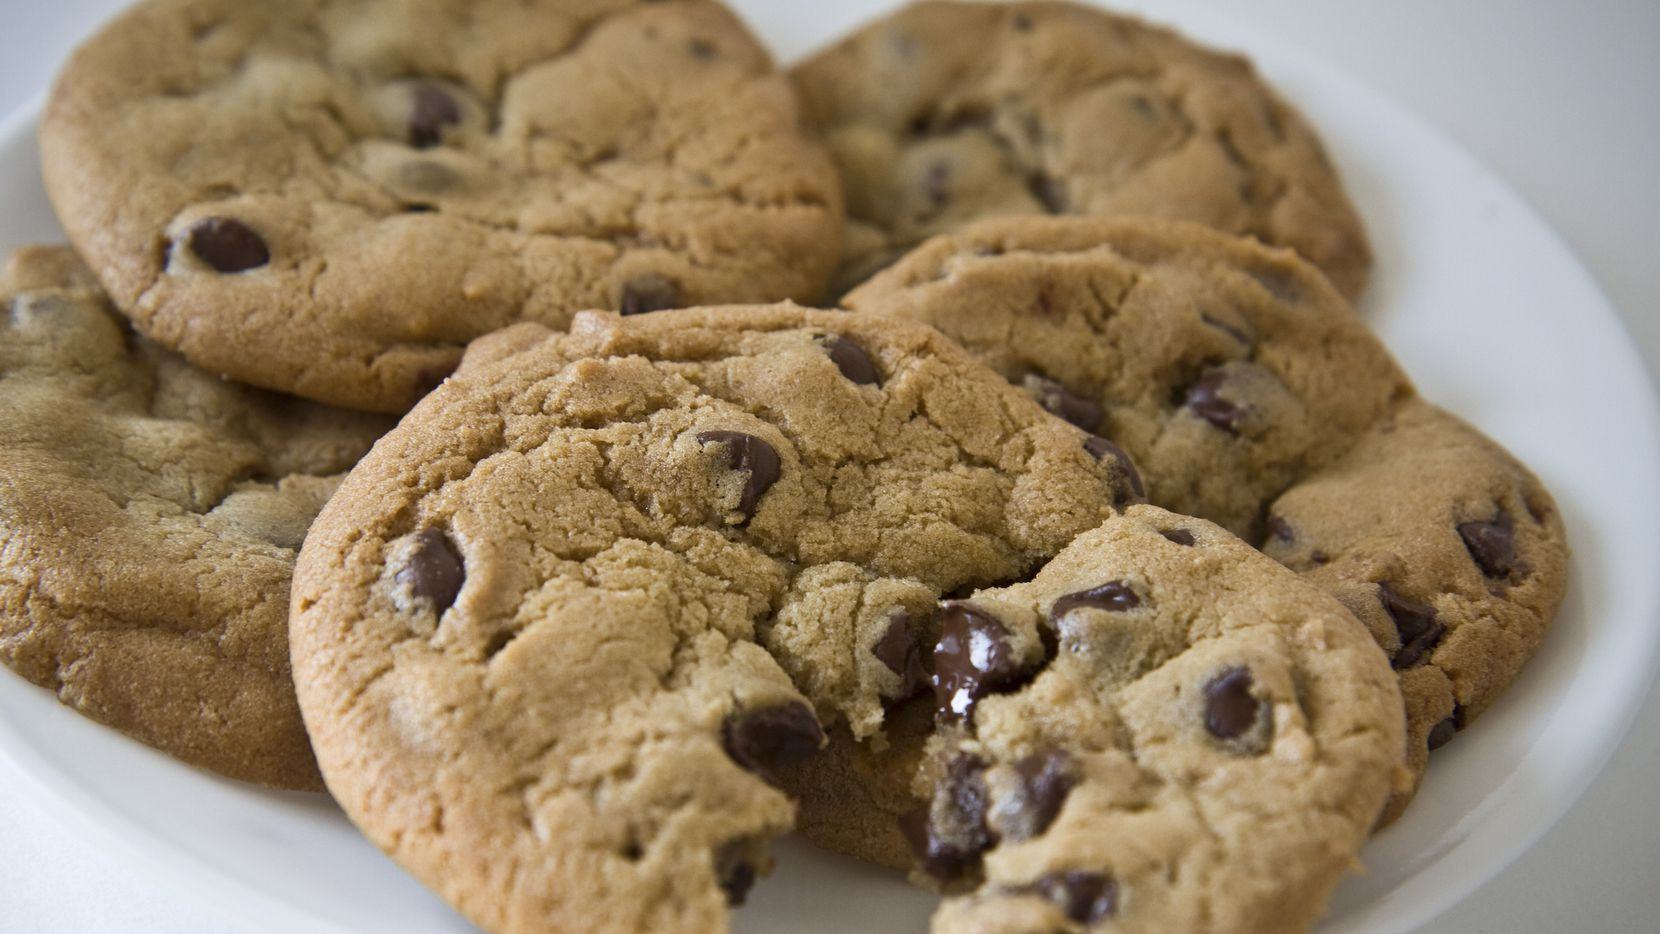 Chocolate chip cookies from Tiff's Treats. (Tiff's Treats)